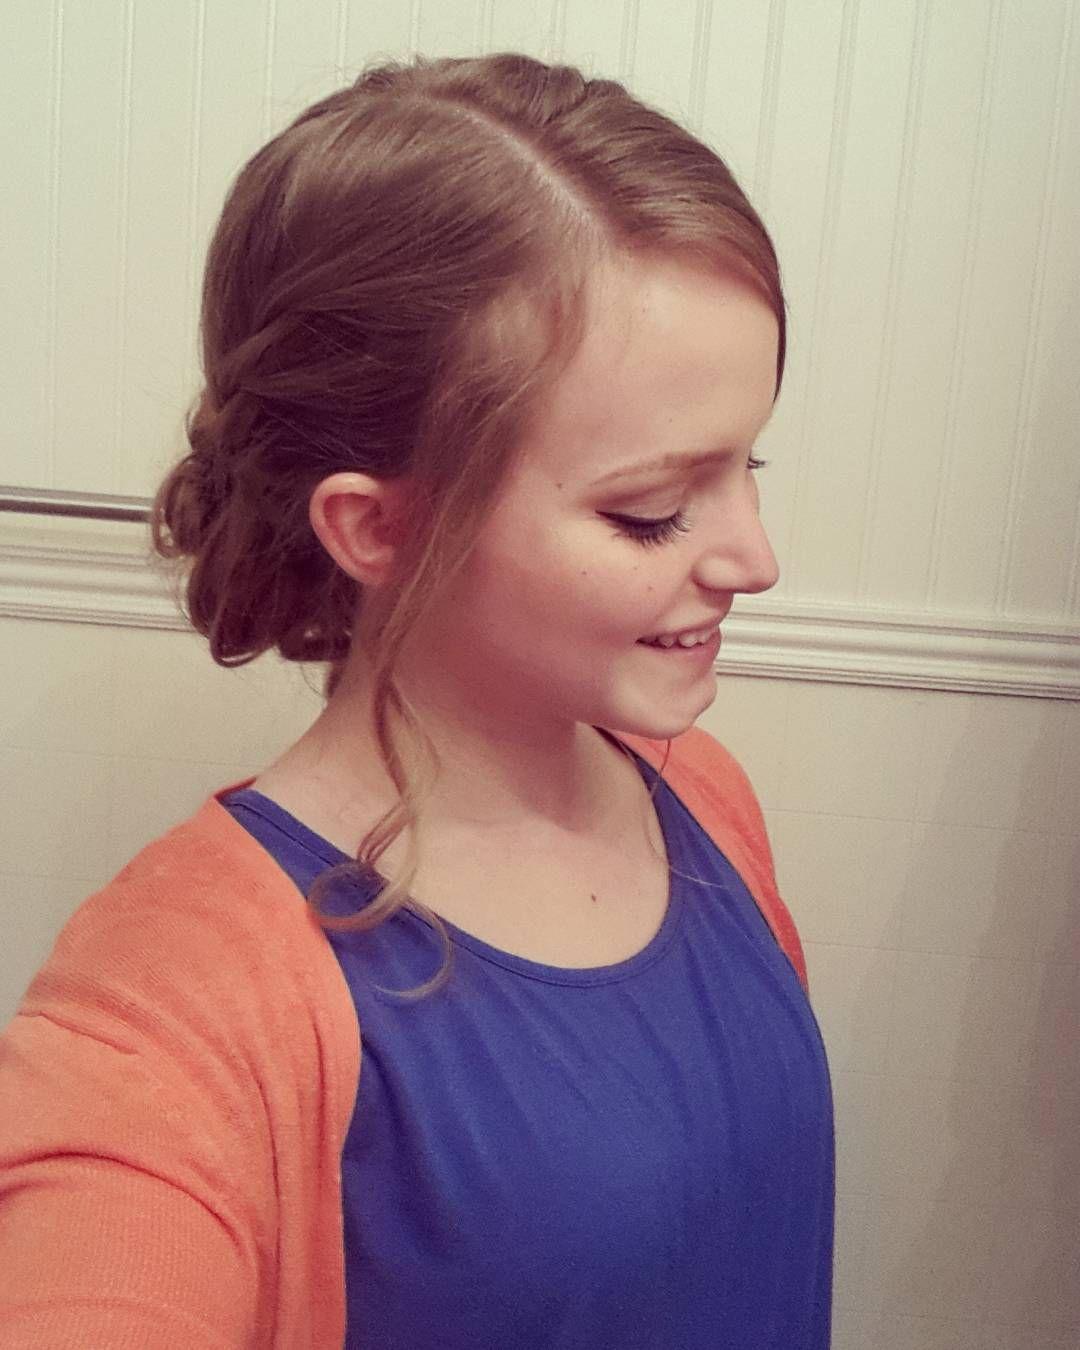 "39 Likes, 2 Comments - Willow and Heather (@thebraidedsisters) on Instagram: ""I adore updos 😙 . . . #thebraidedsisters #braids #braidideas #braidinspo #twistandbun #twist…"""